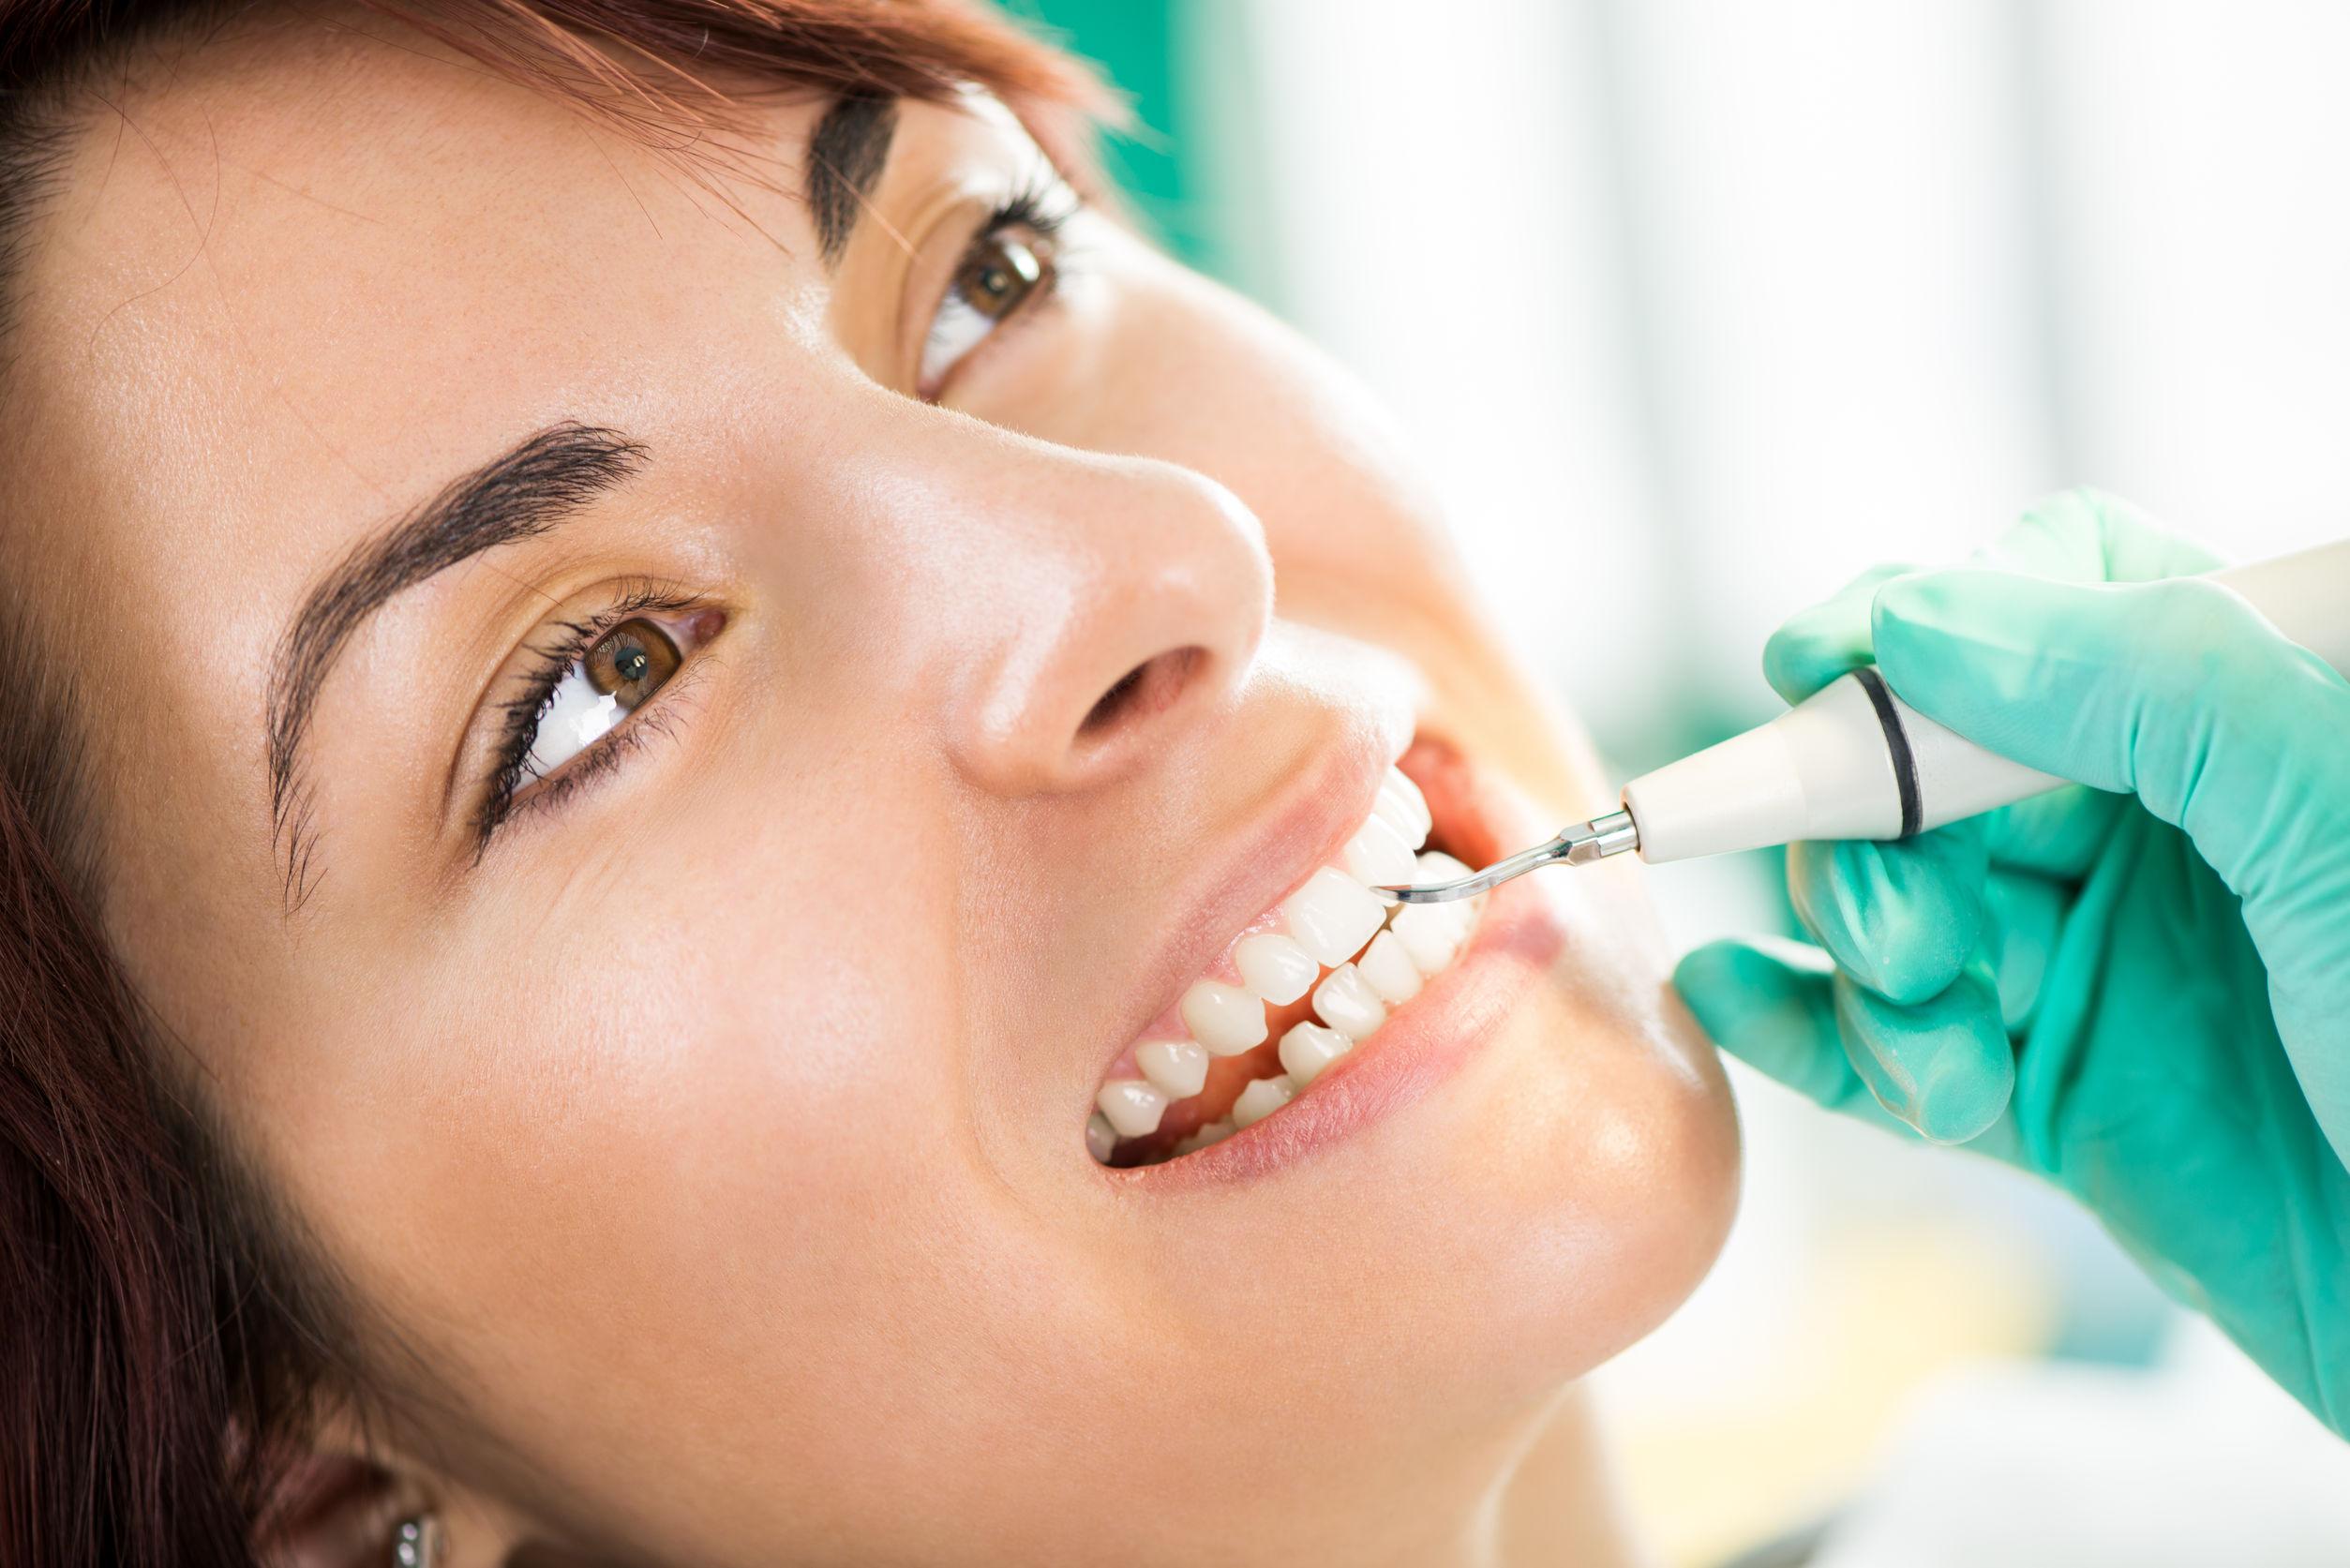 dentaql hygiene services 26380115_l